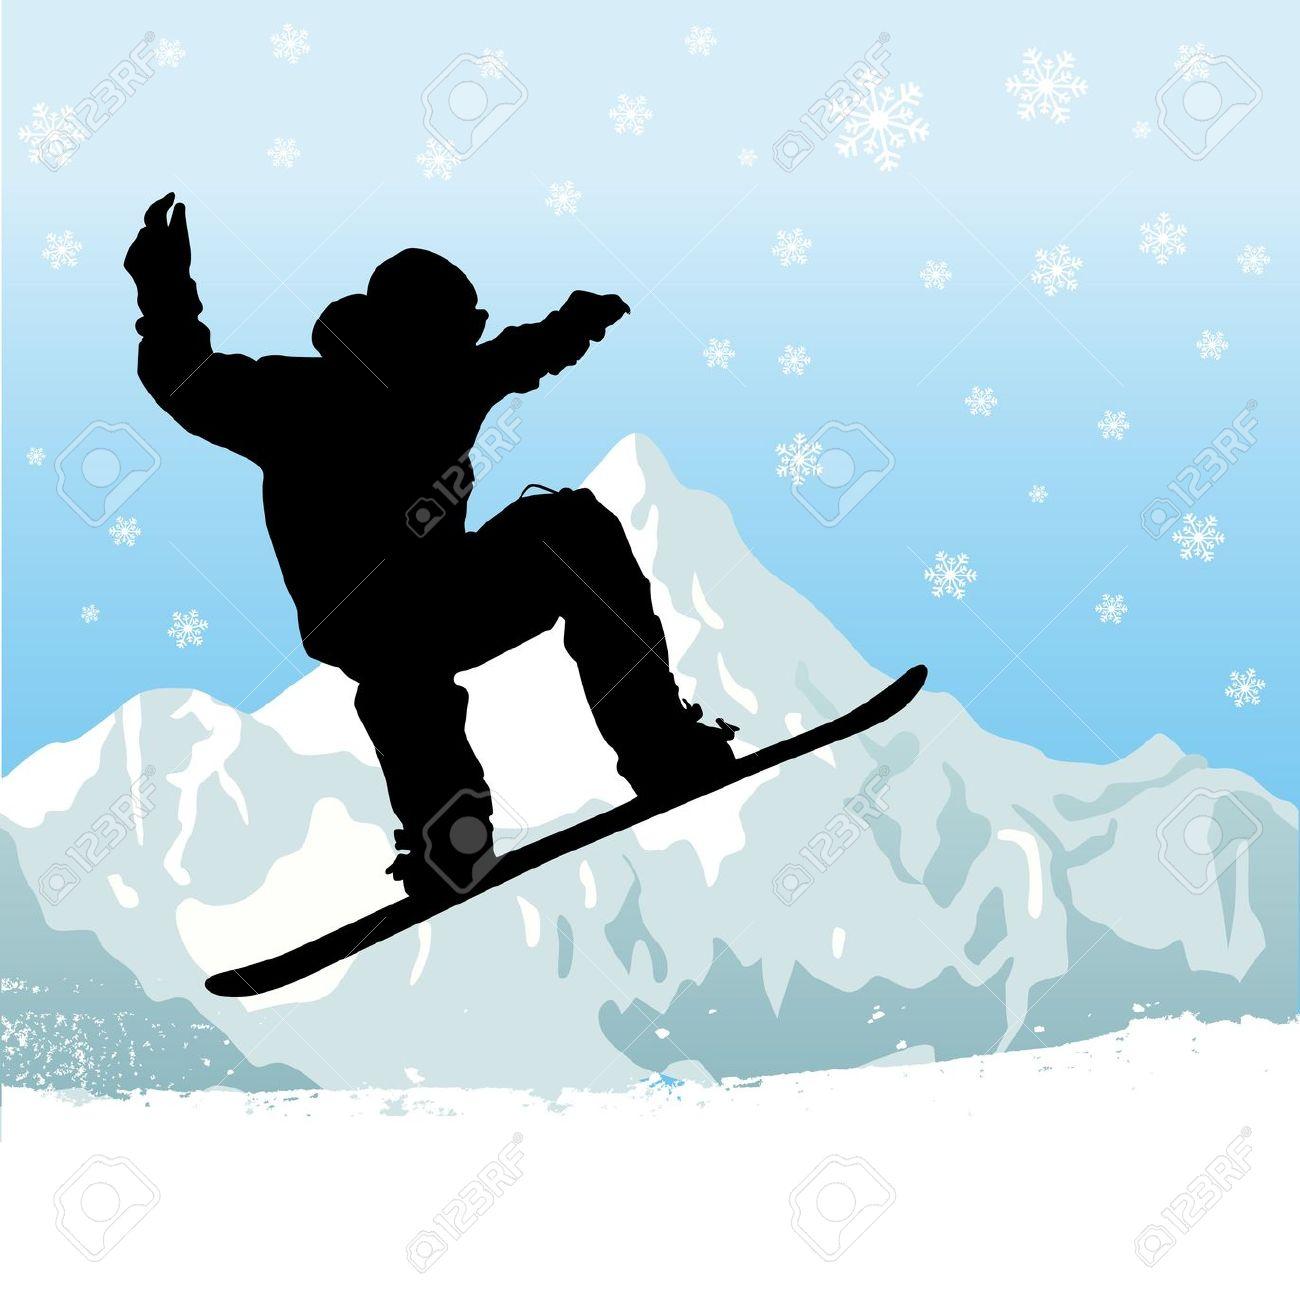 snowboarder: snowboarding-snowboarder: snowboarding-6